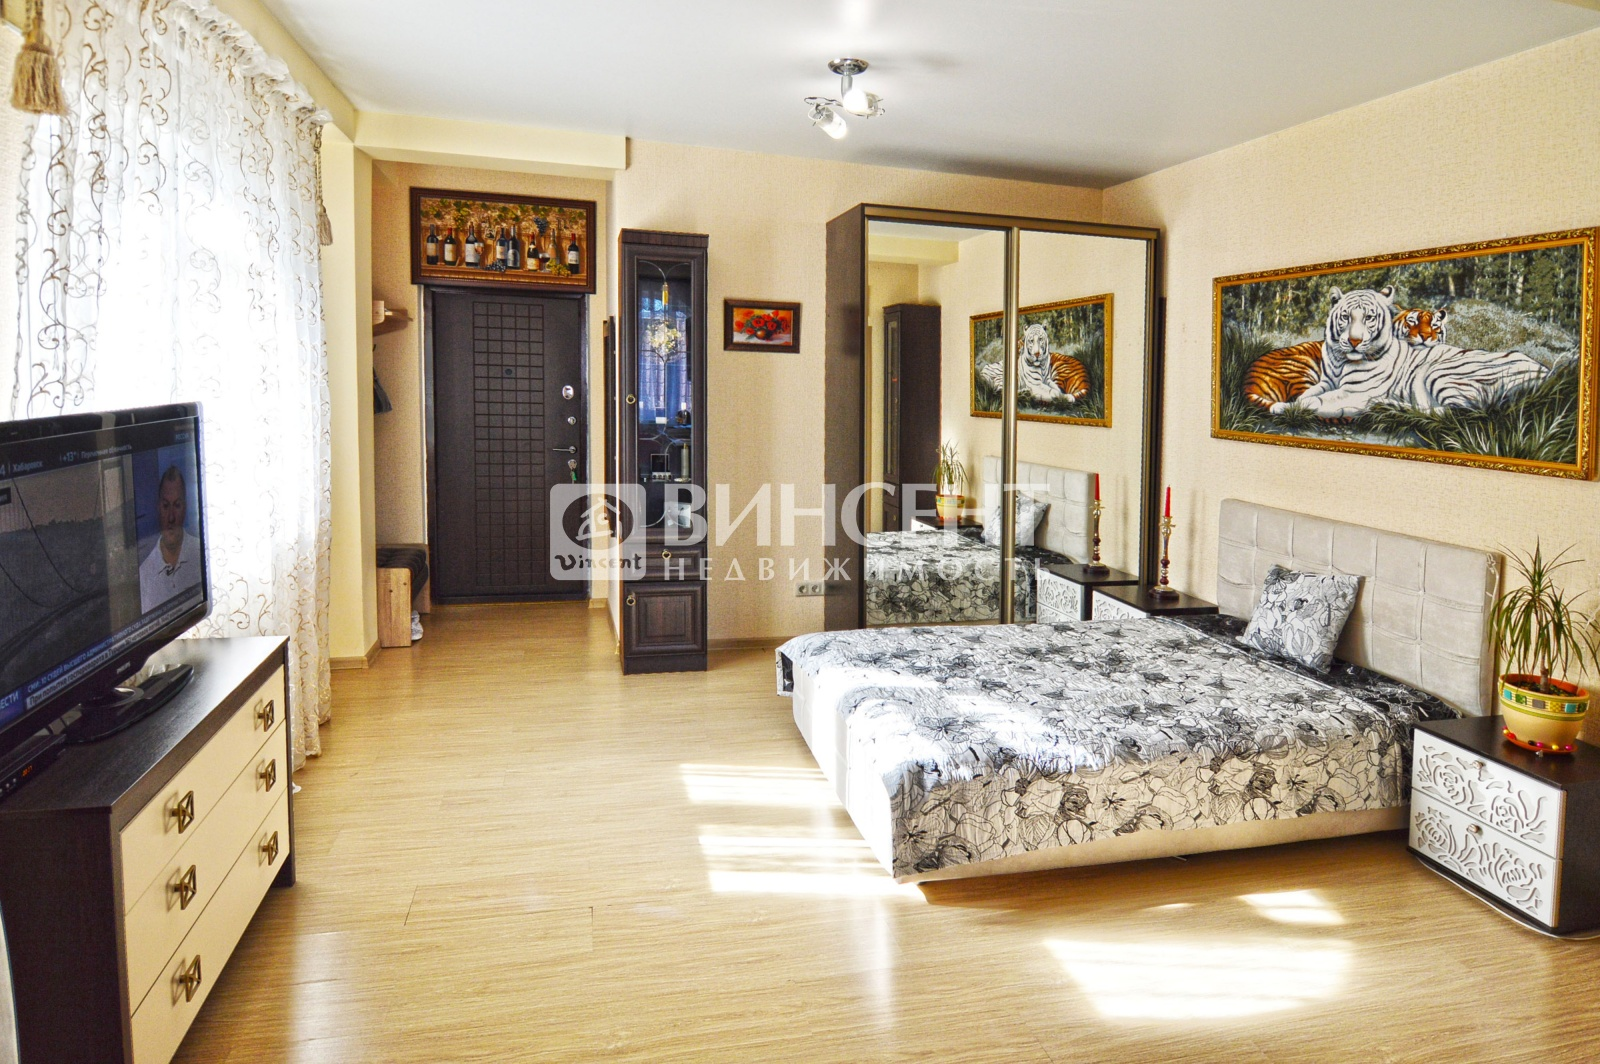 1 комнатная квартира 32 м² на ул. Альпийская, г. Сочи - фото